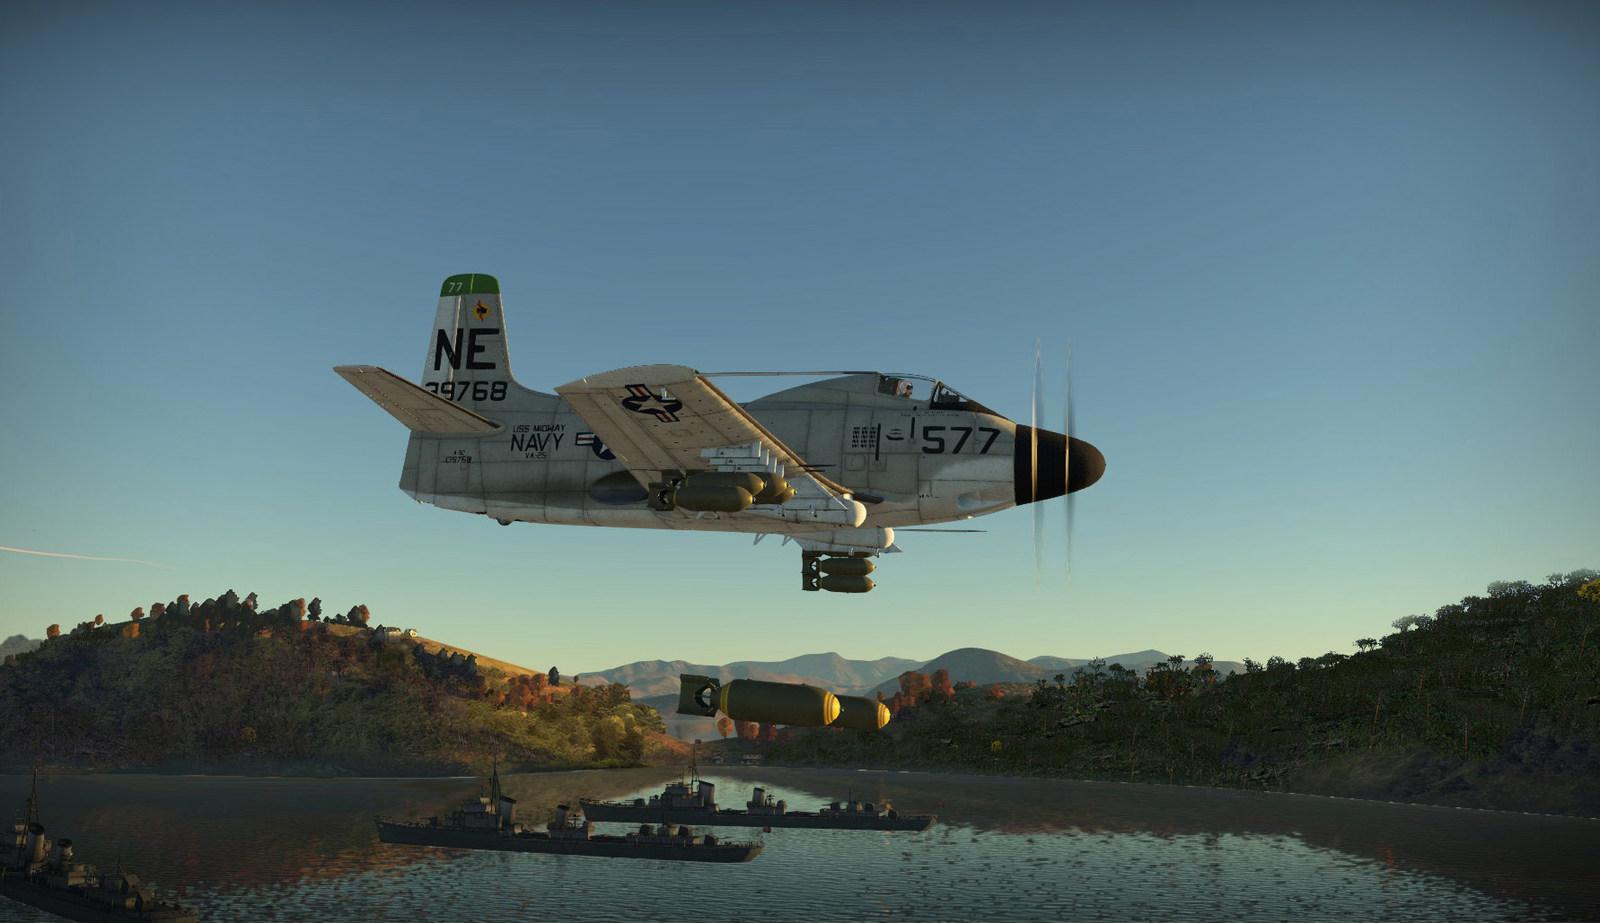 1965 Tonkin gulf. Bombs gone, on NVA's ships.